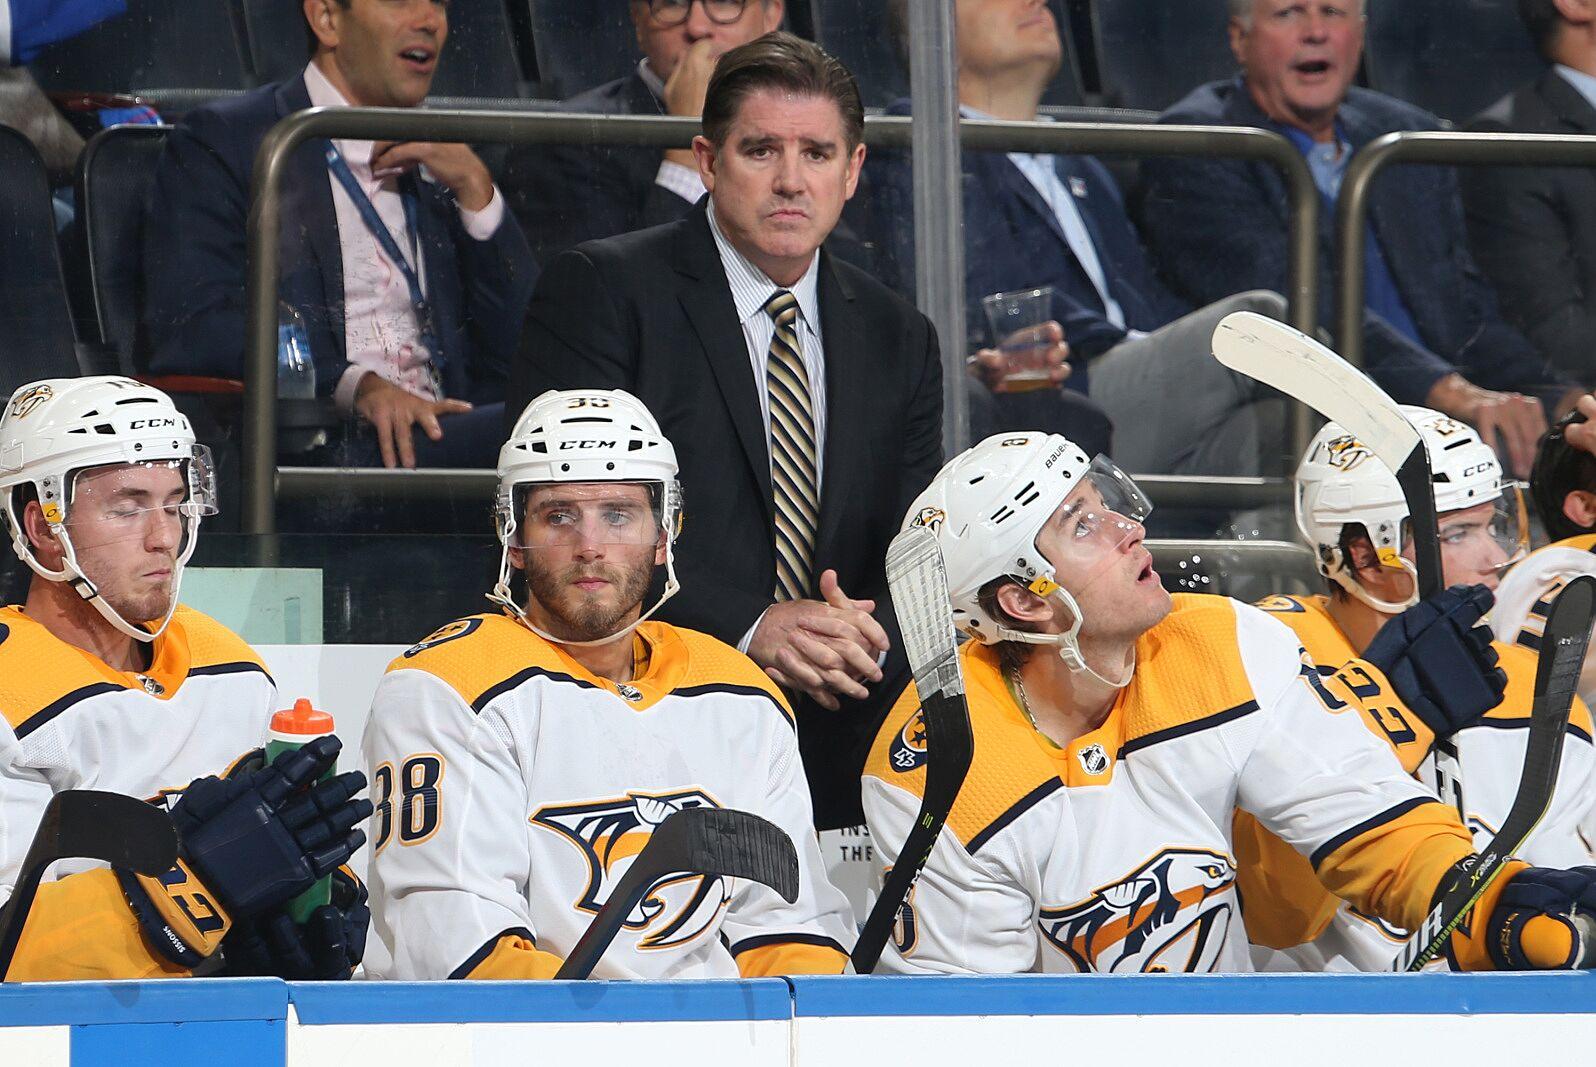 Nashville Predators: Predlines staff debates impact of younger players